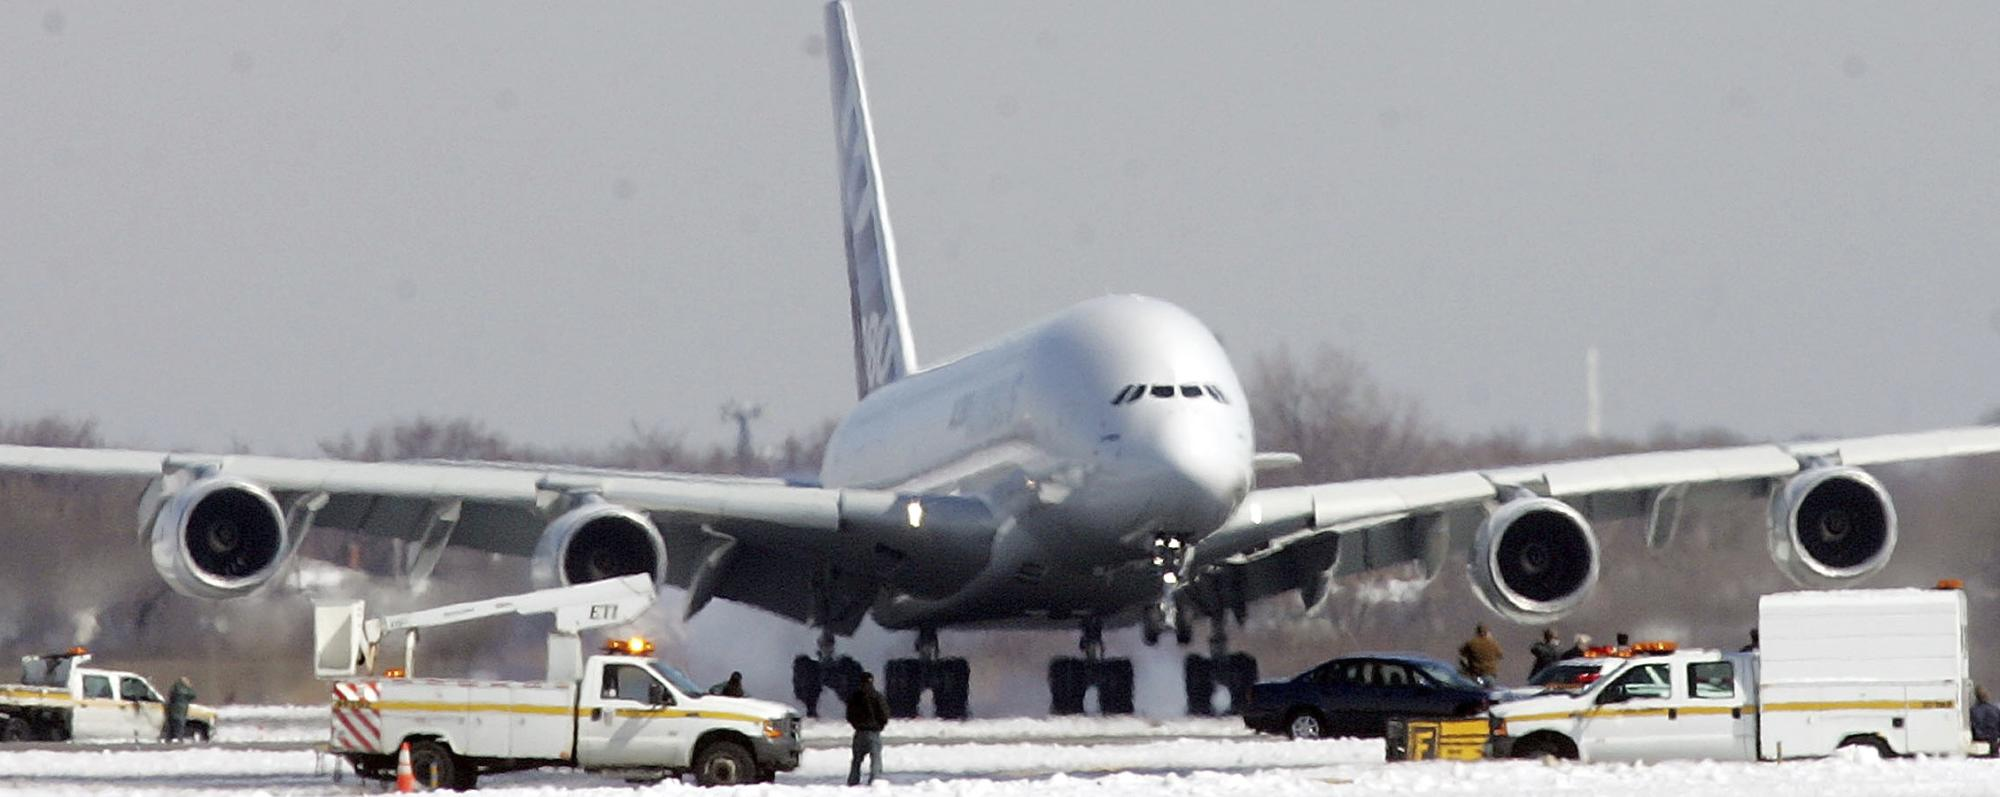 Travel tools Transportation - airport